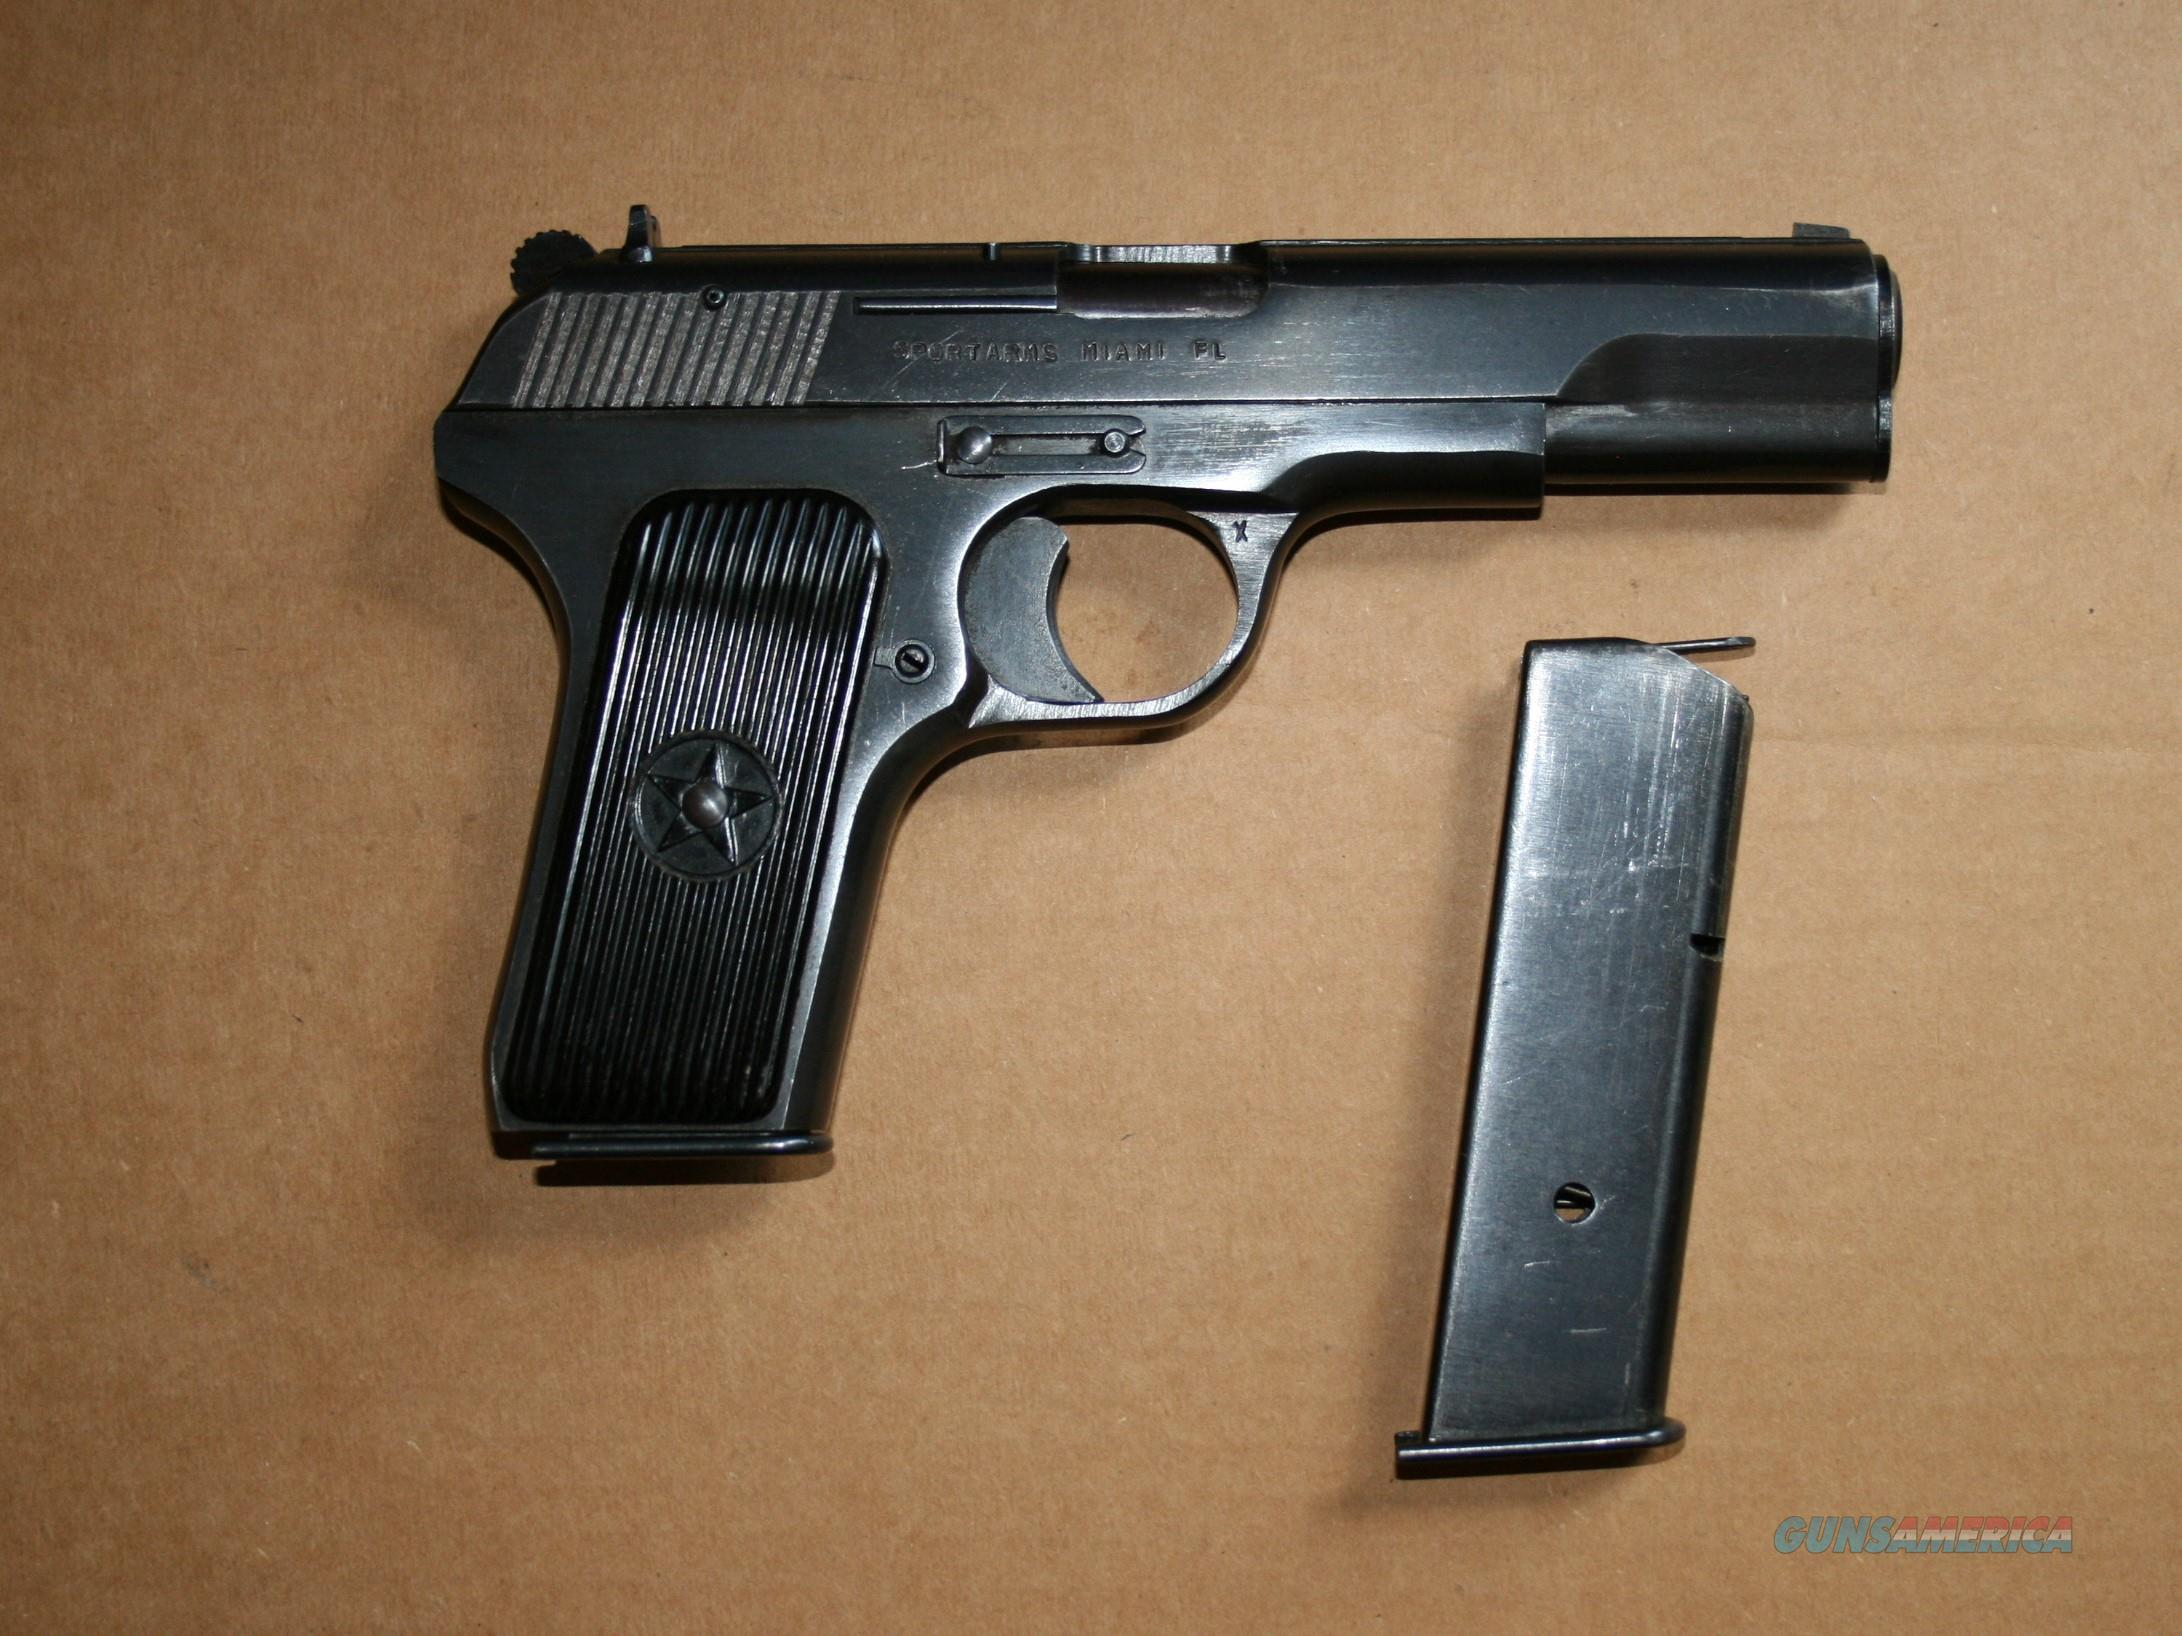 Norinco Chinese Tokarev Model 213 Pistol 9mm